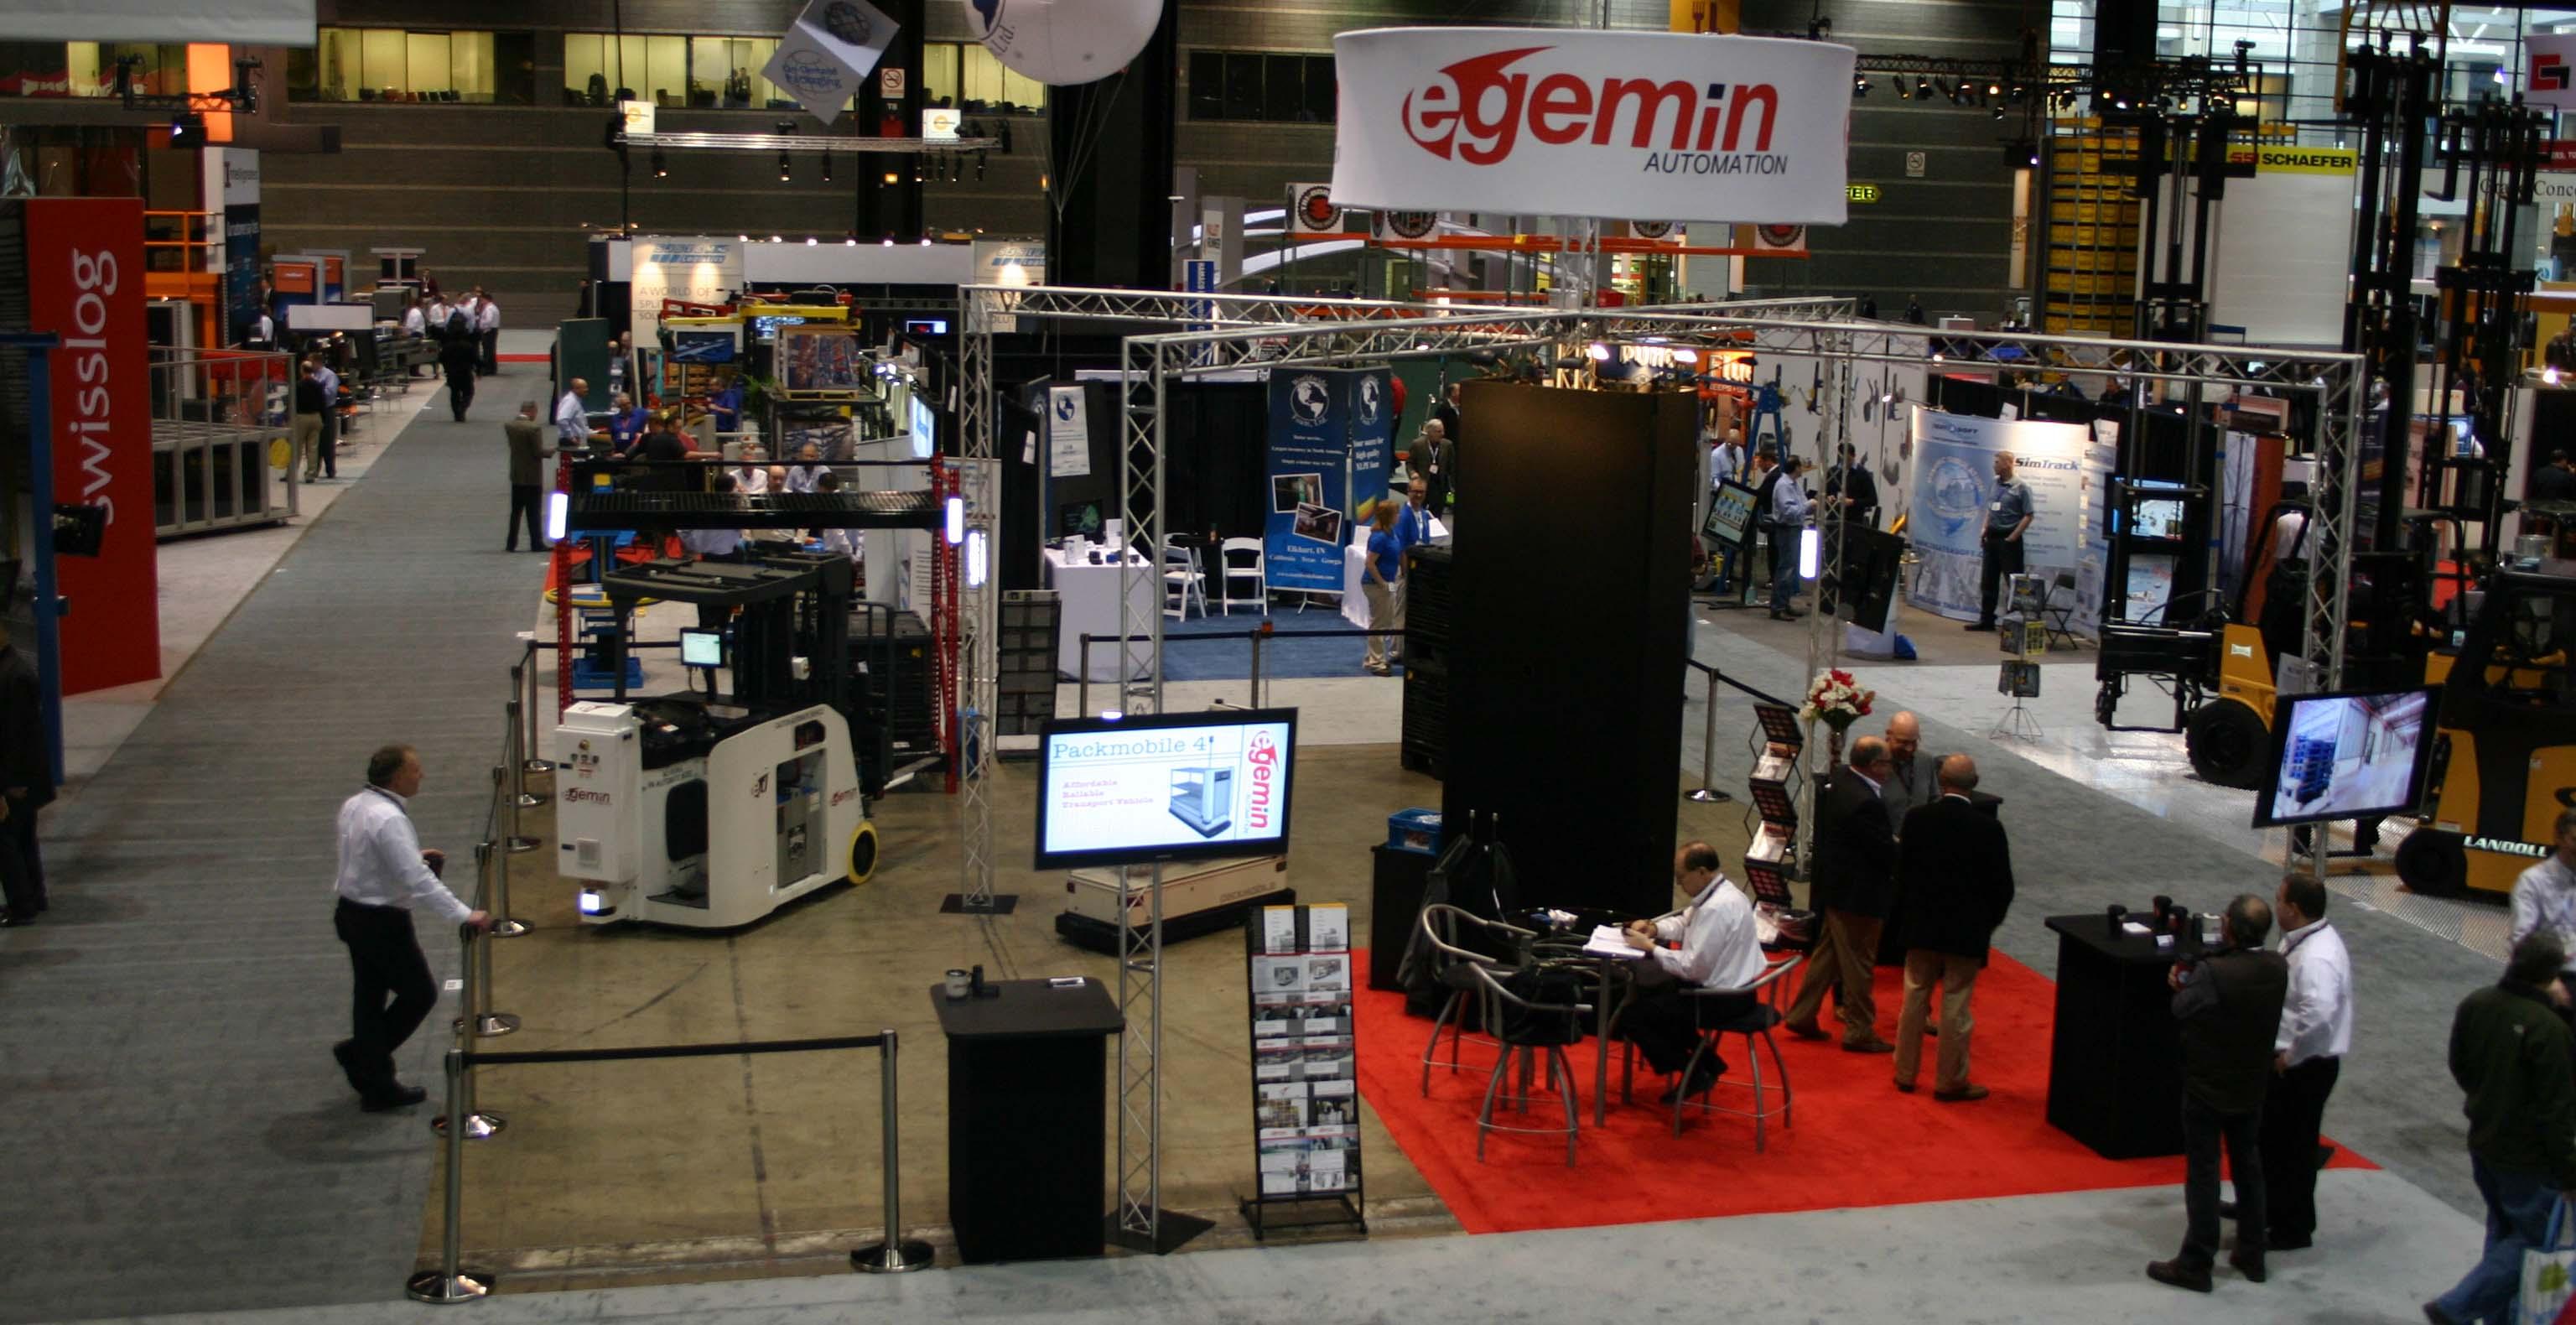 Promat Chicago Exhibition Area